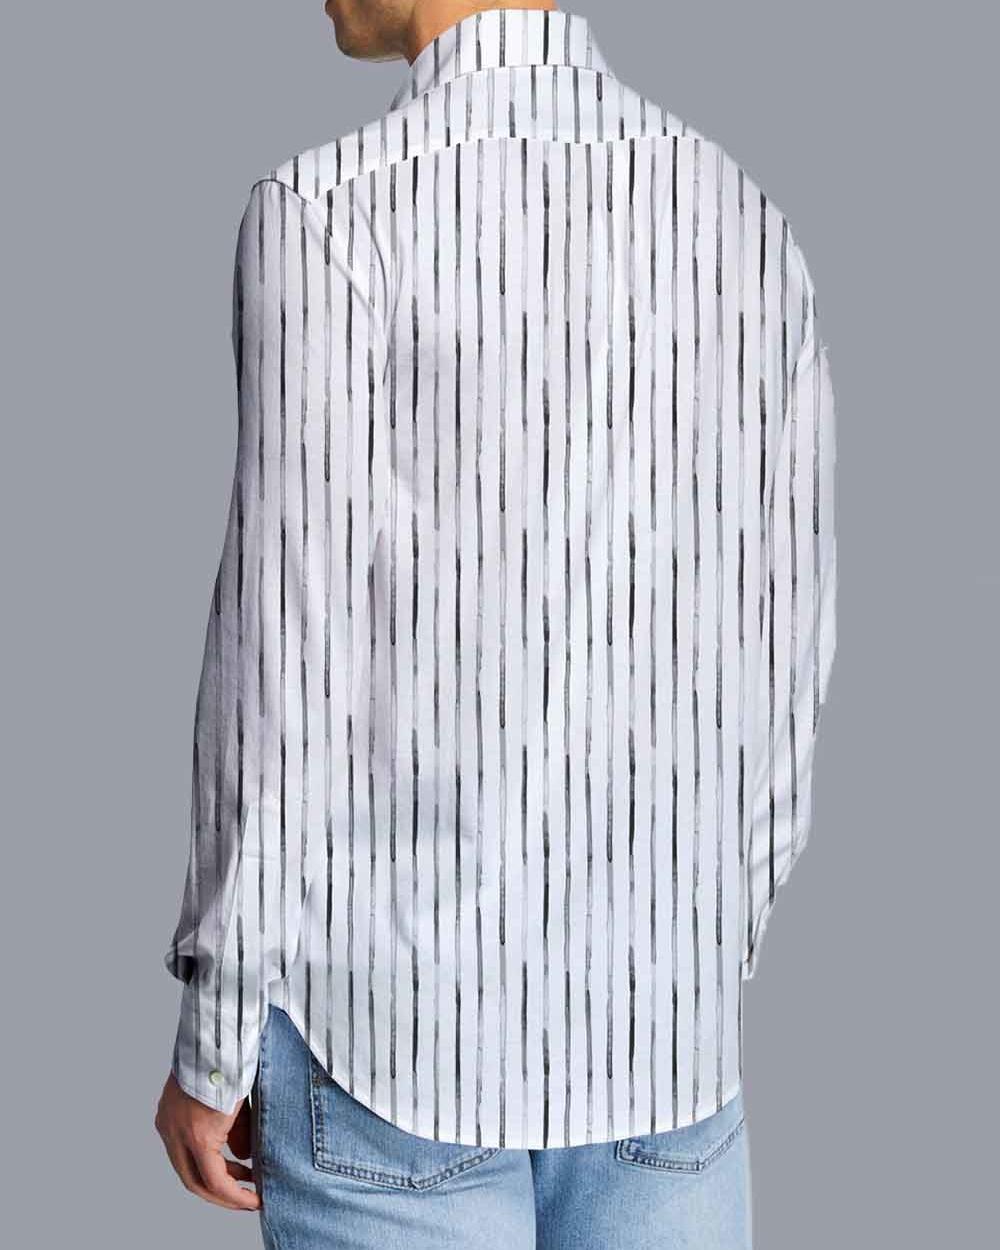 junctionstore|ravirajoria/mensshirt/grey/side